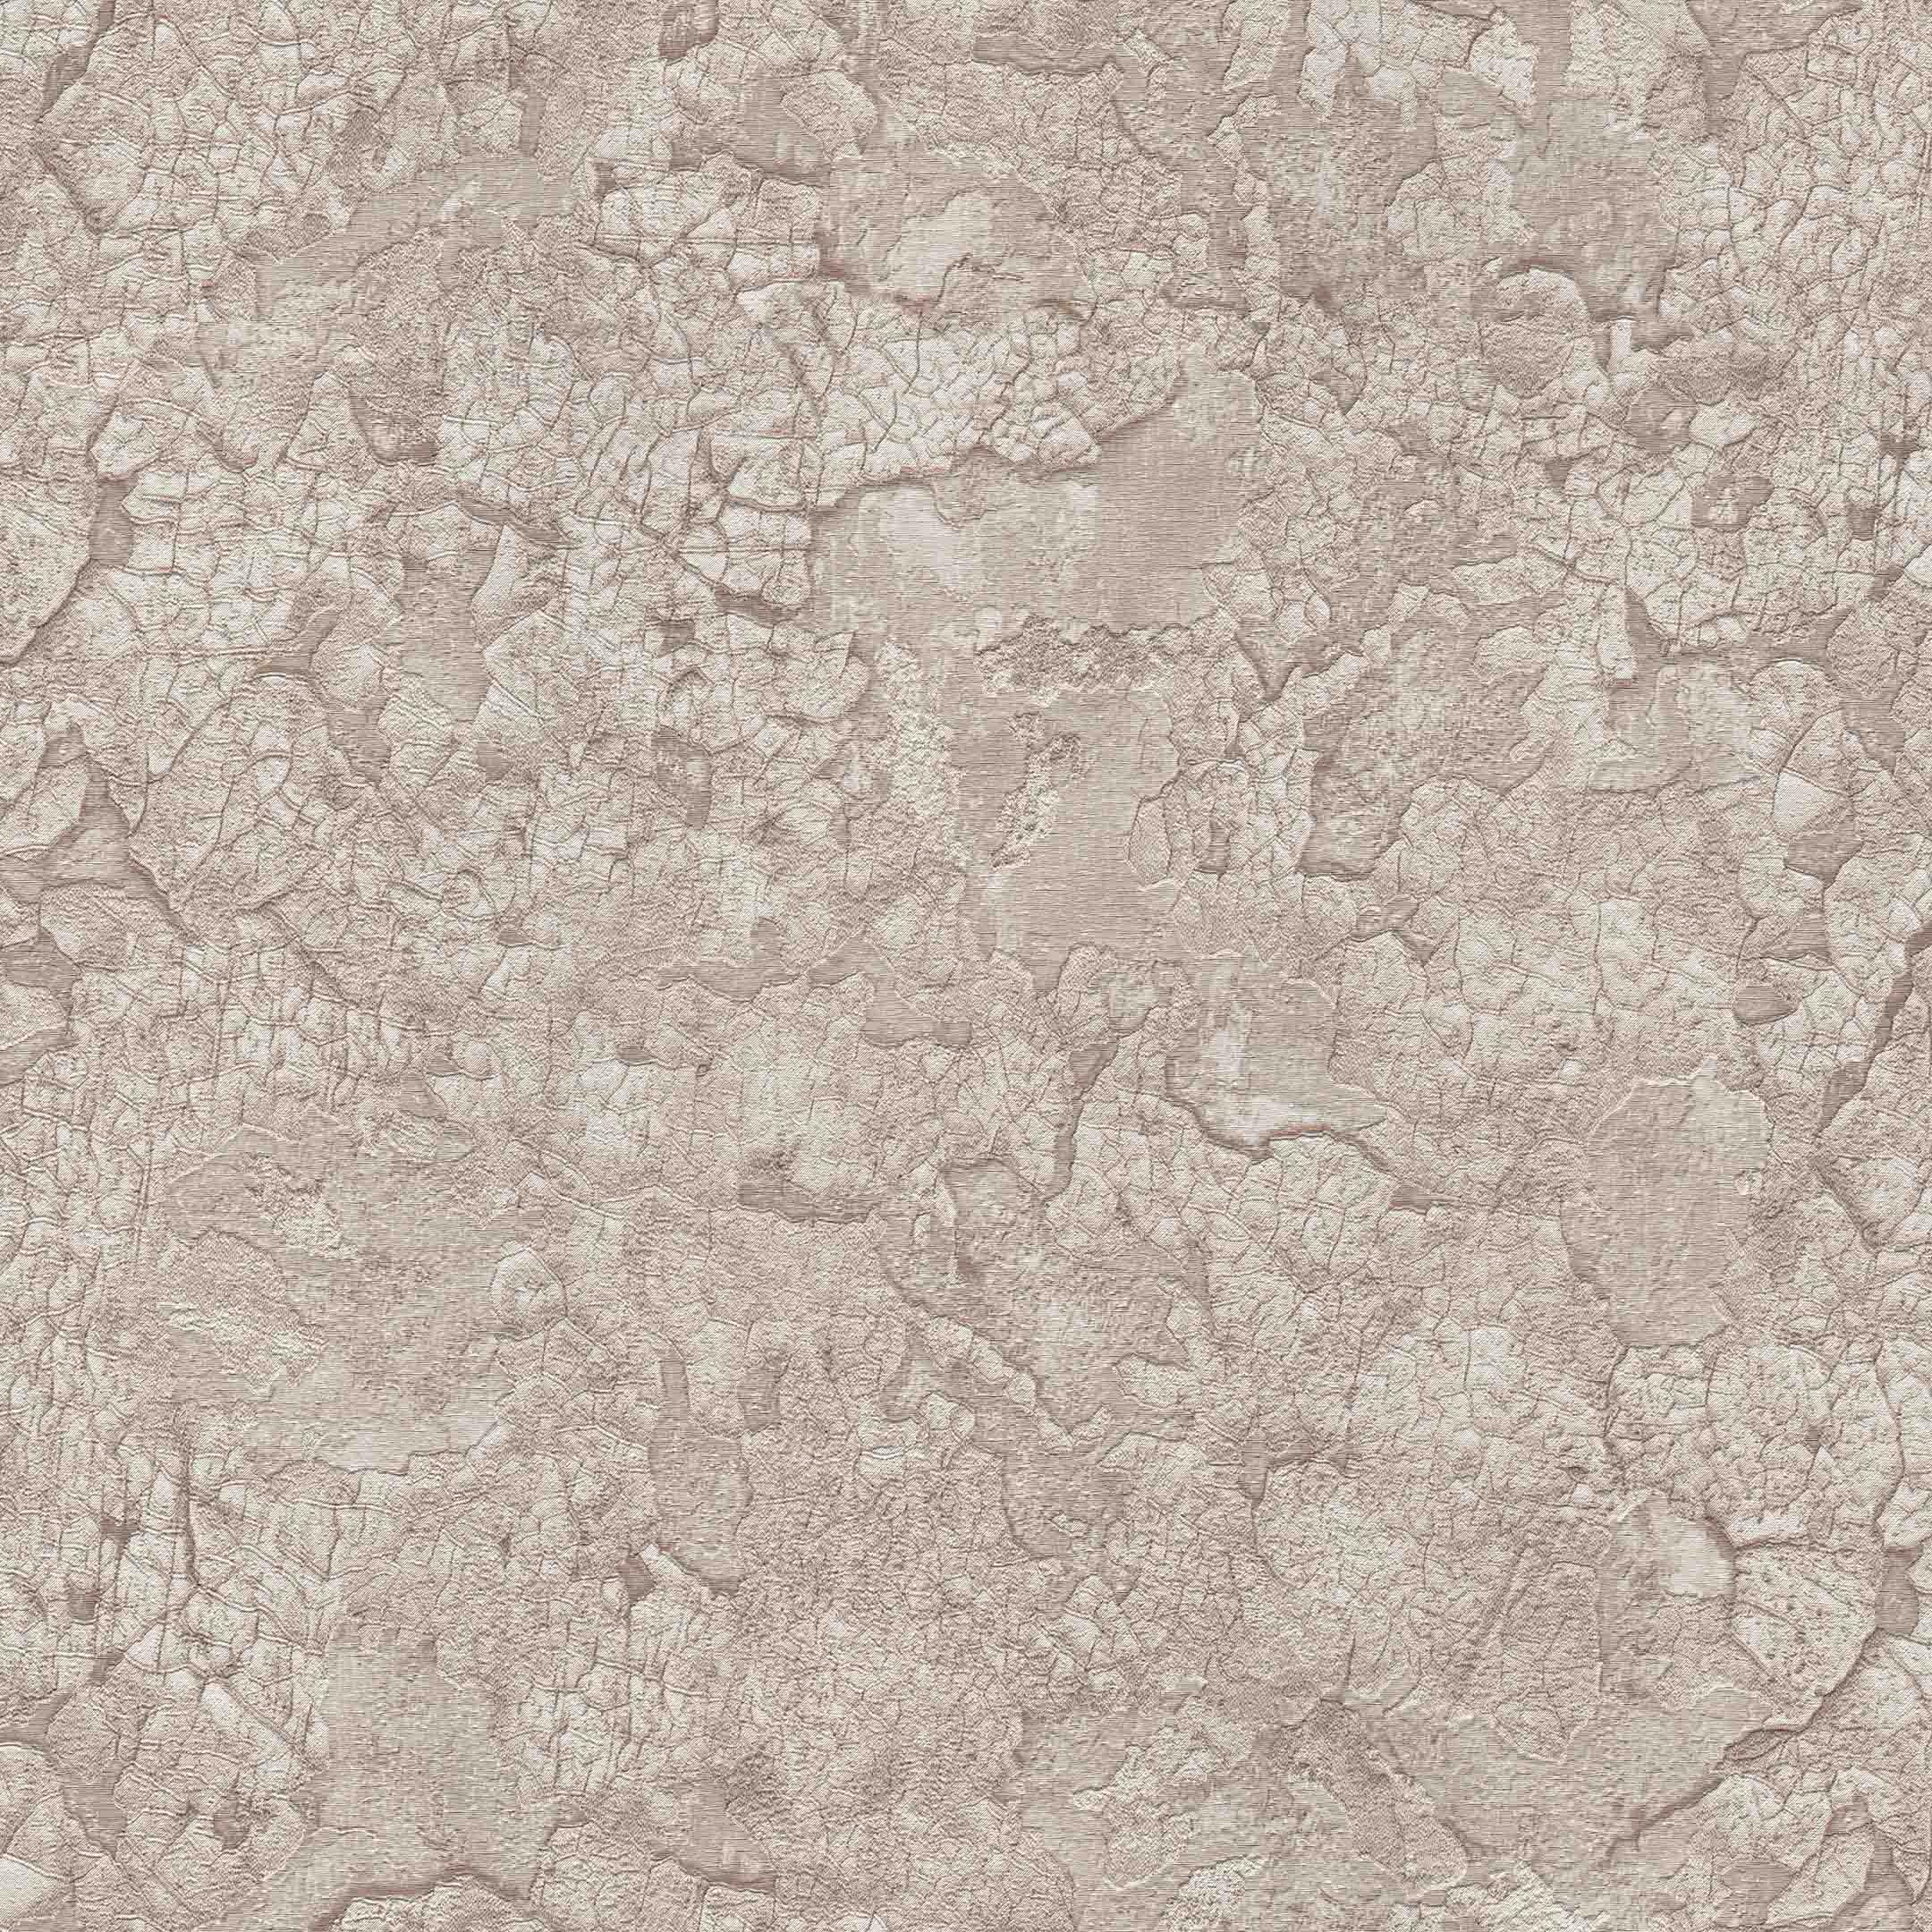 цена на Обои виниловые на флизелиновой основе Zambaiti Murella Moda M53055 (1,06х10,05 м)